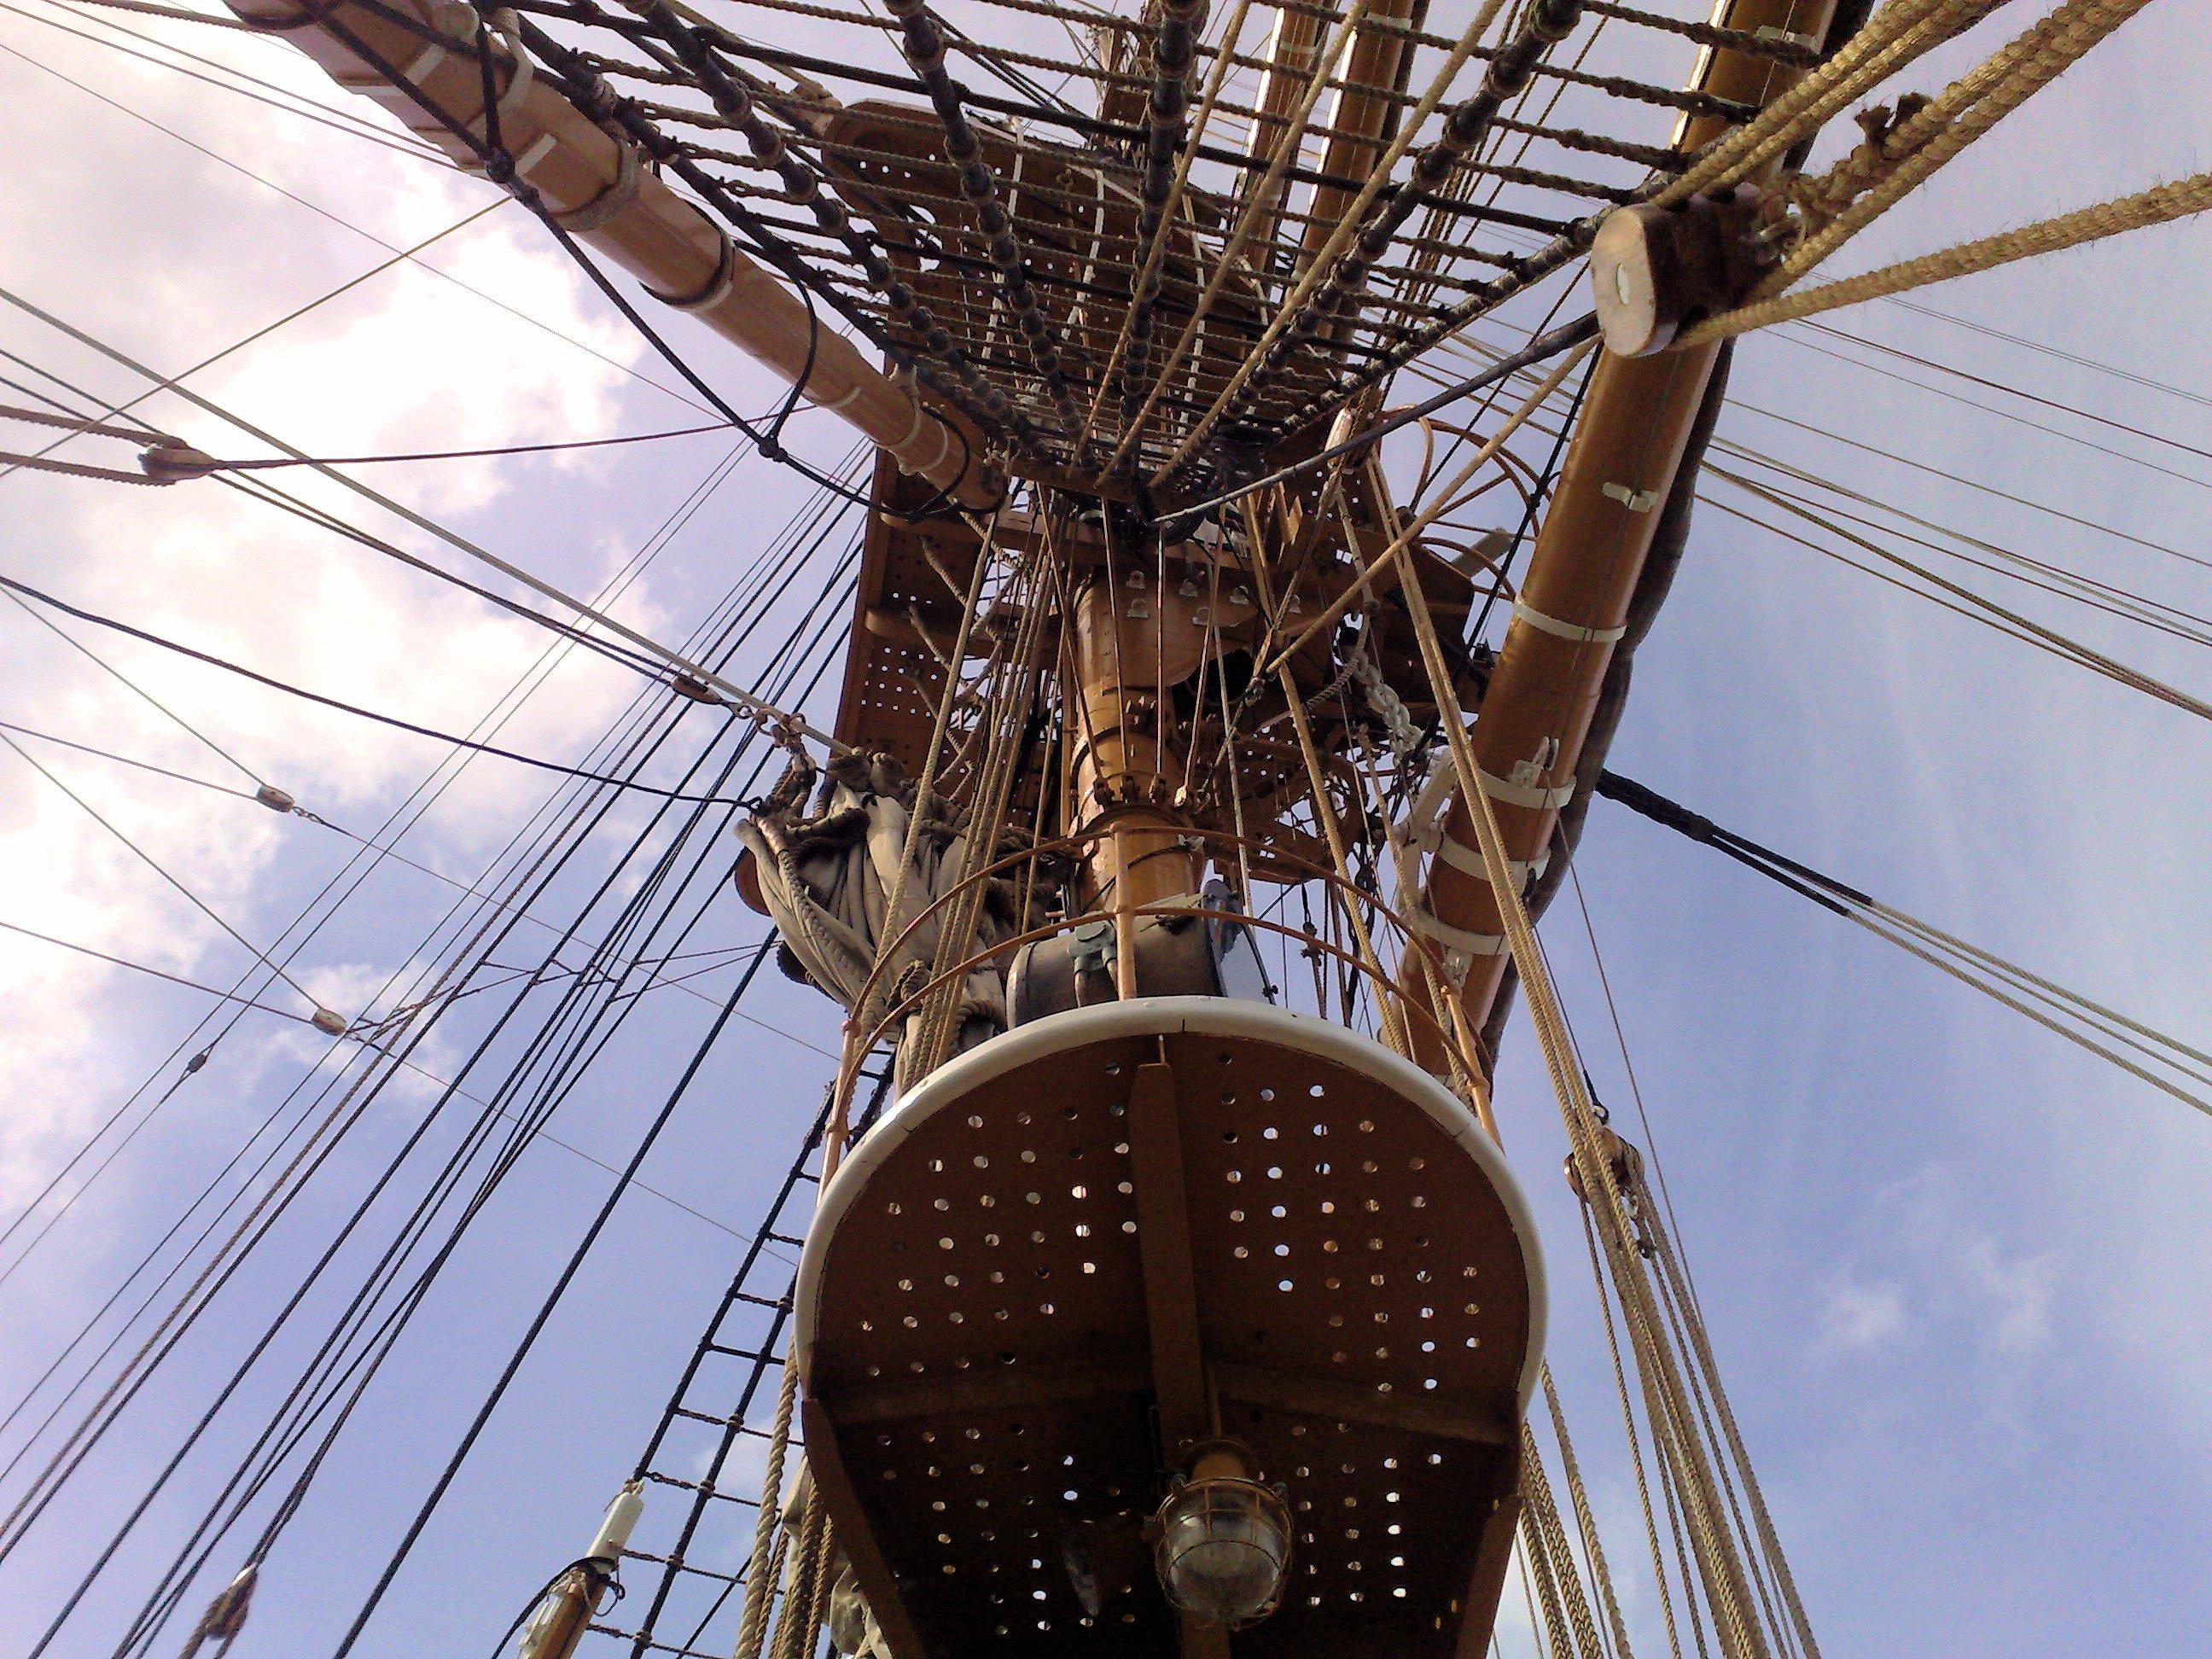 Detail on sailer photo